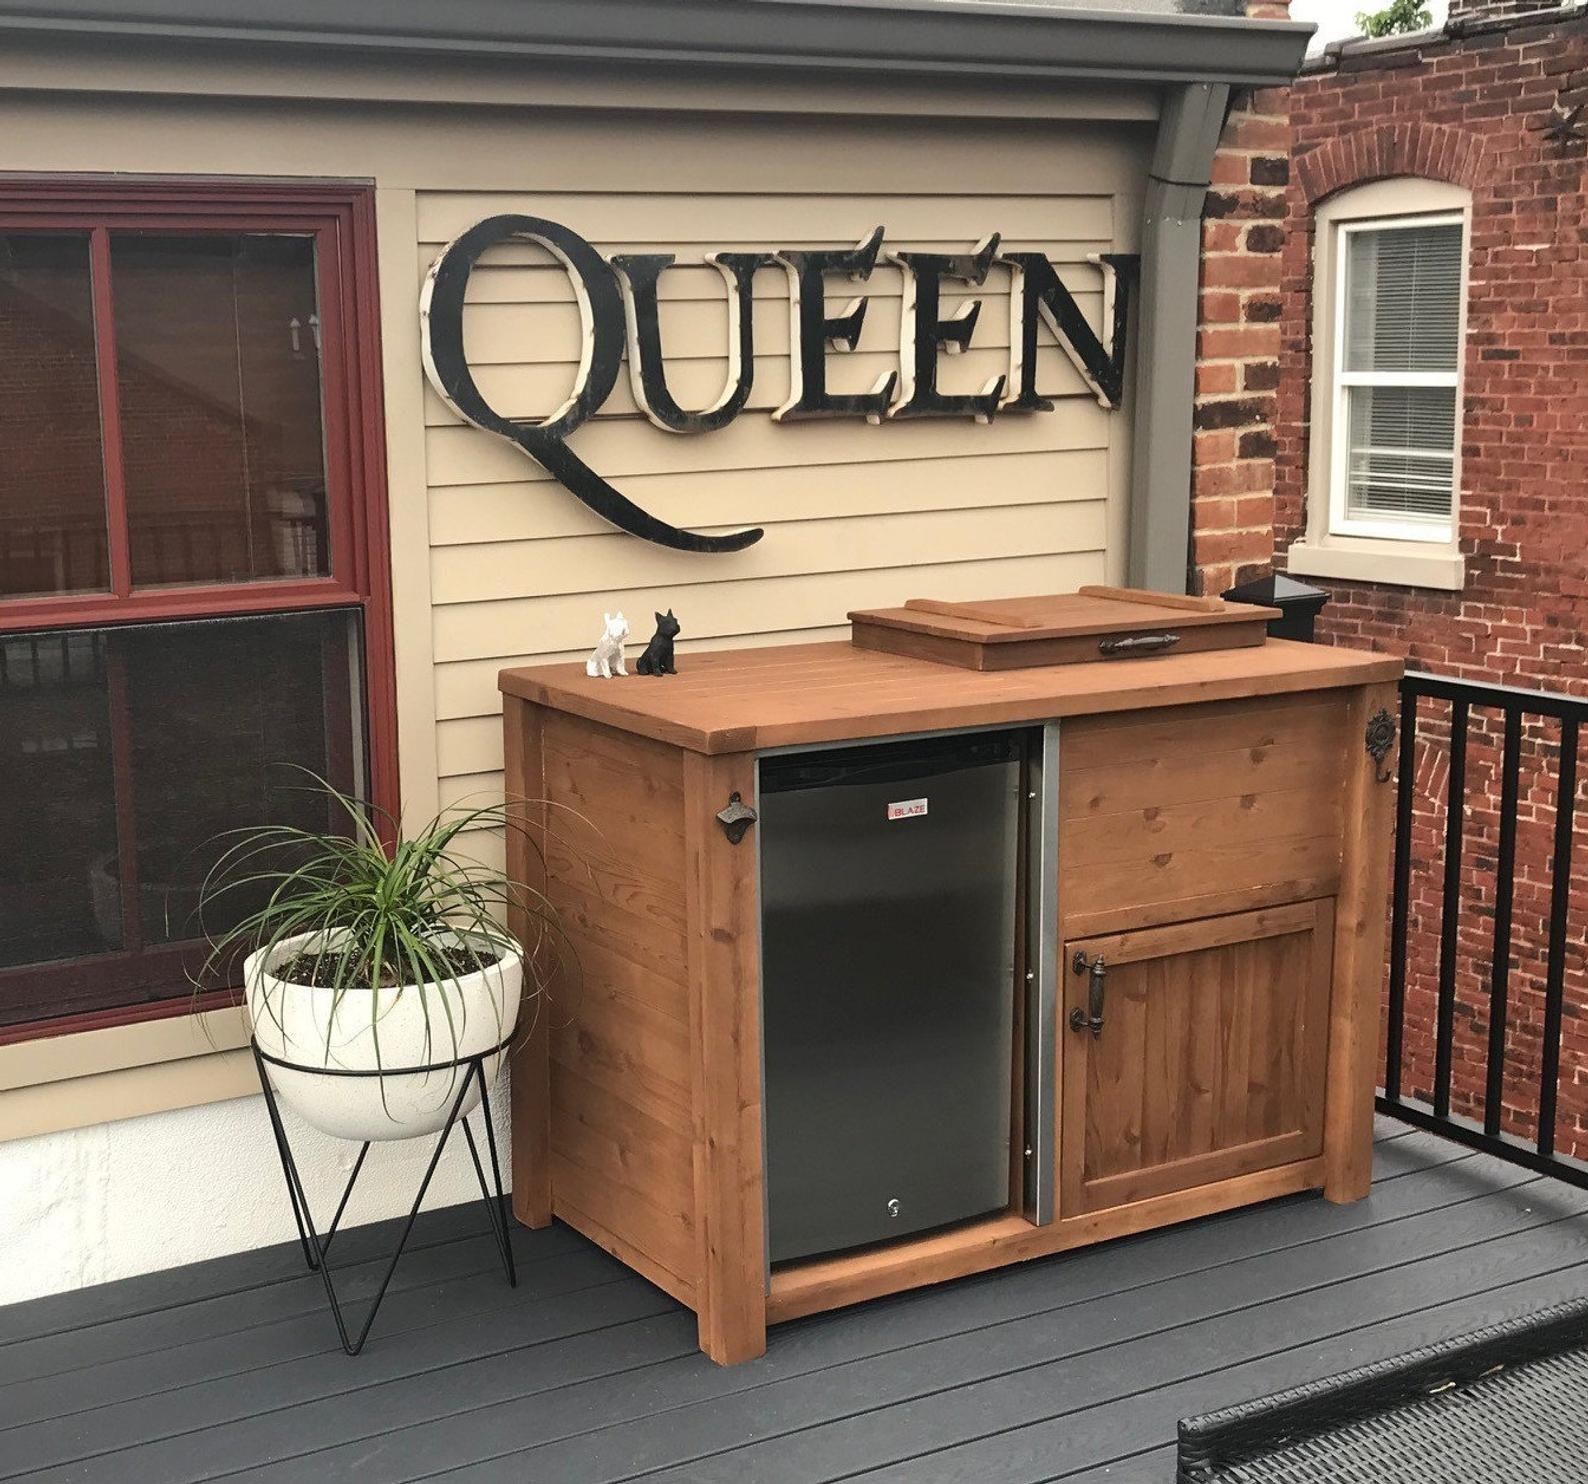 Mini Fridge Cooler Table Can Be Customized In 2020 Outdoor Patio Bar Outdoor Fridge Cabinet Mini Bar